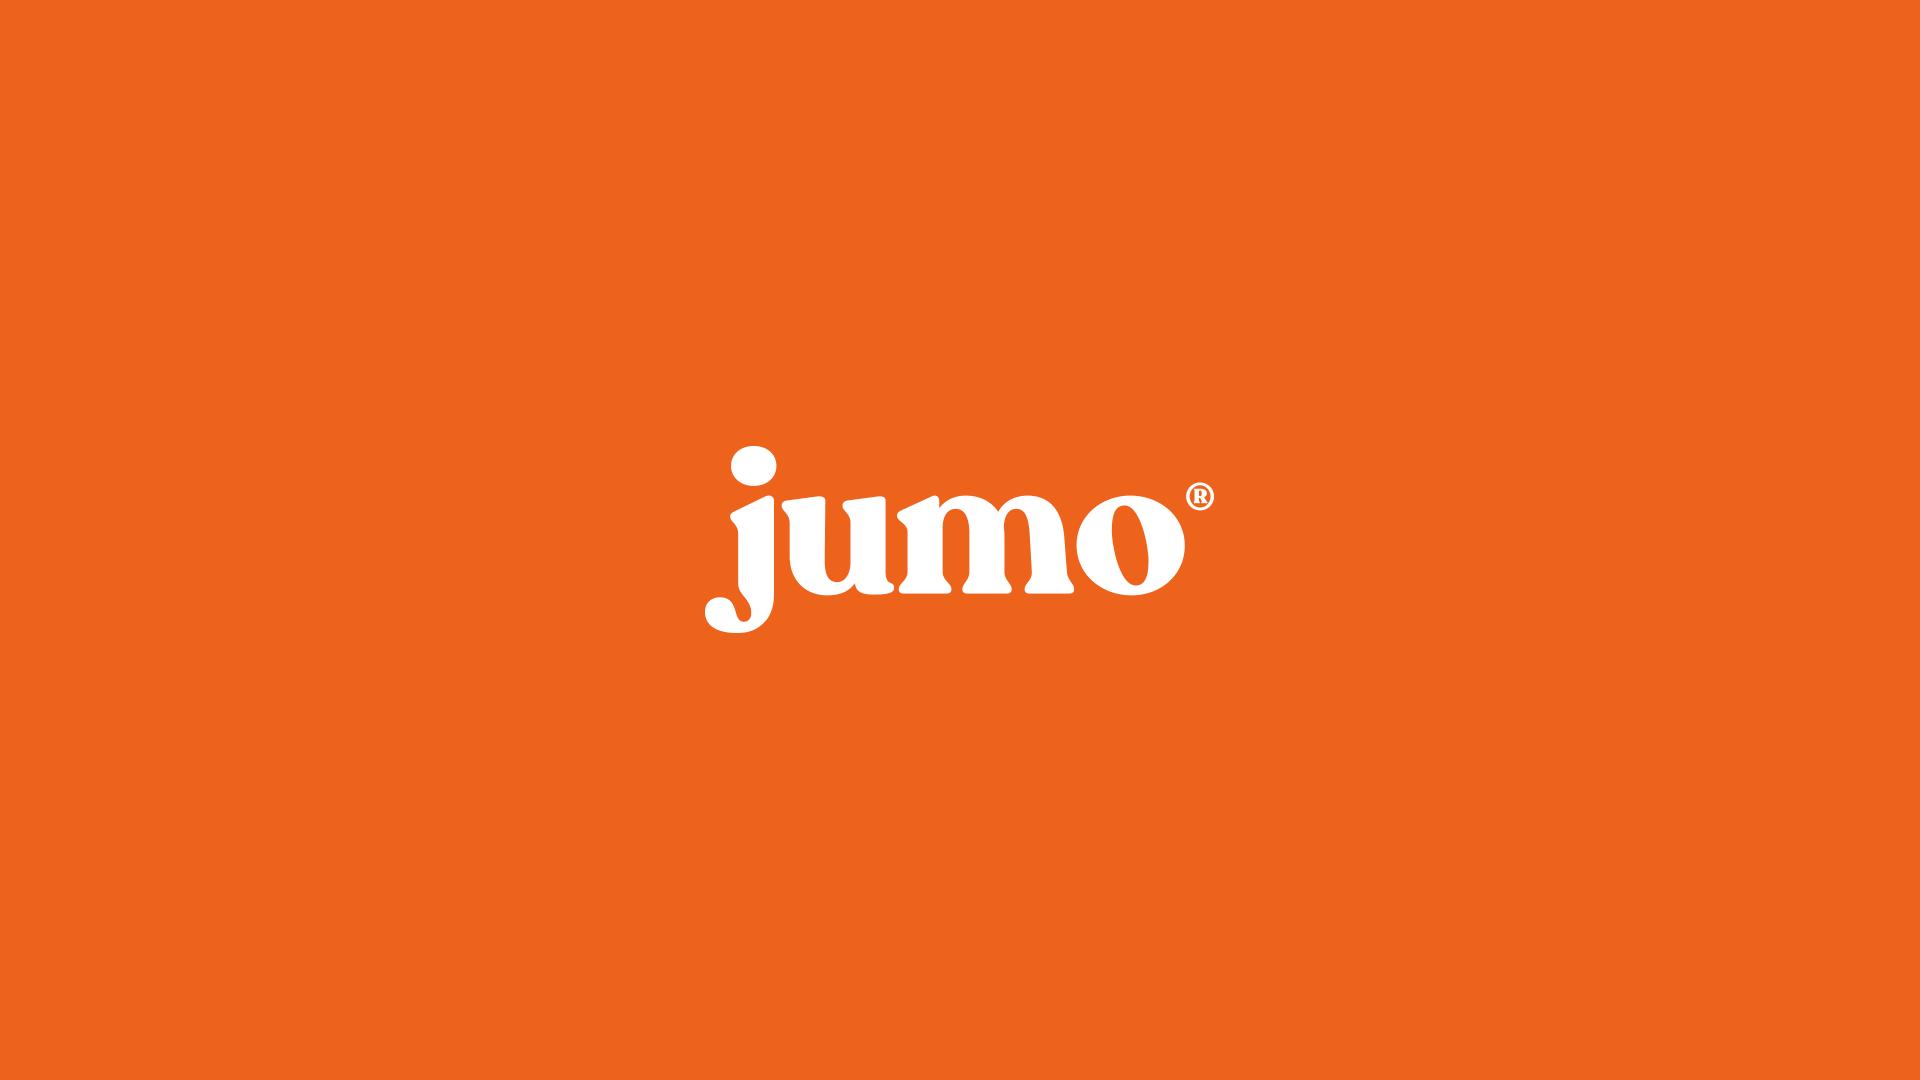 Jumo  by Buas - Creative Work - $i